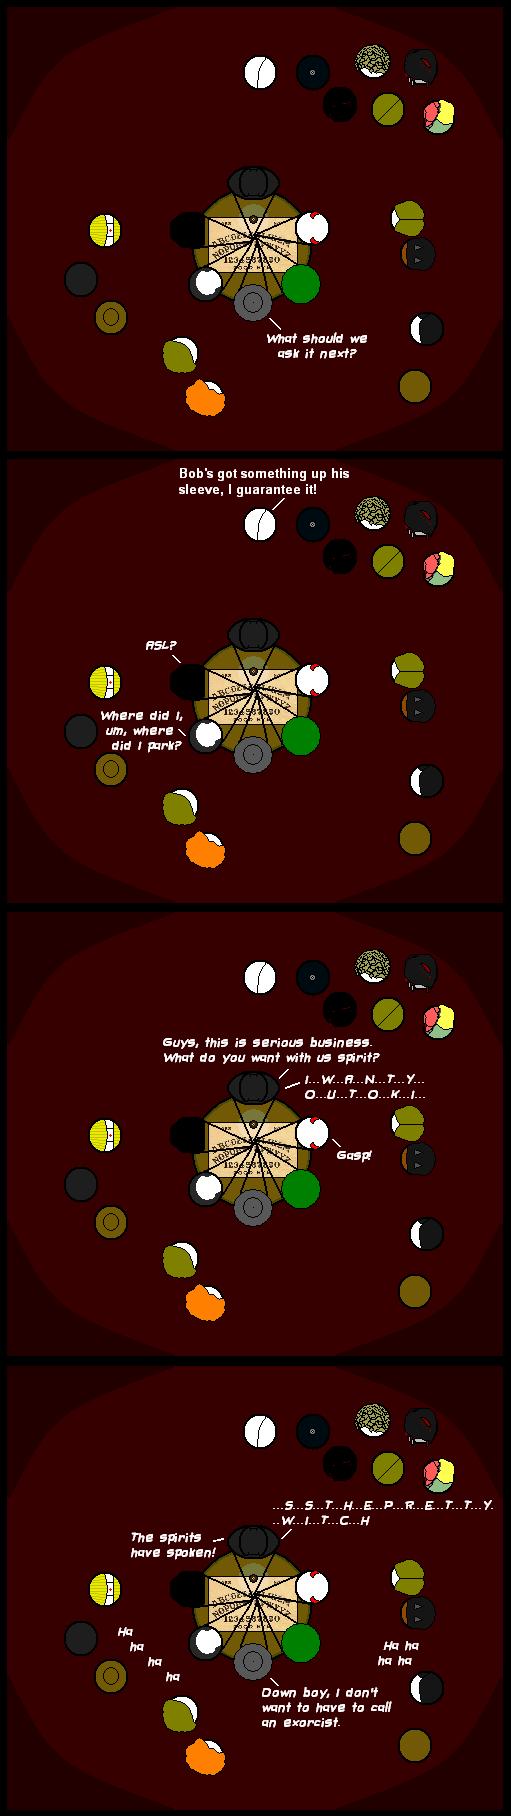 26 Ouija Board